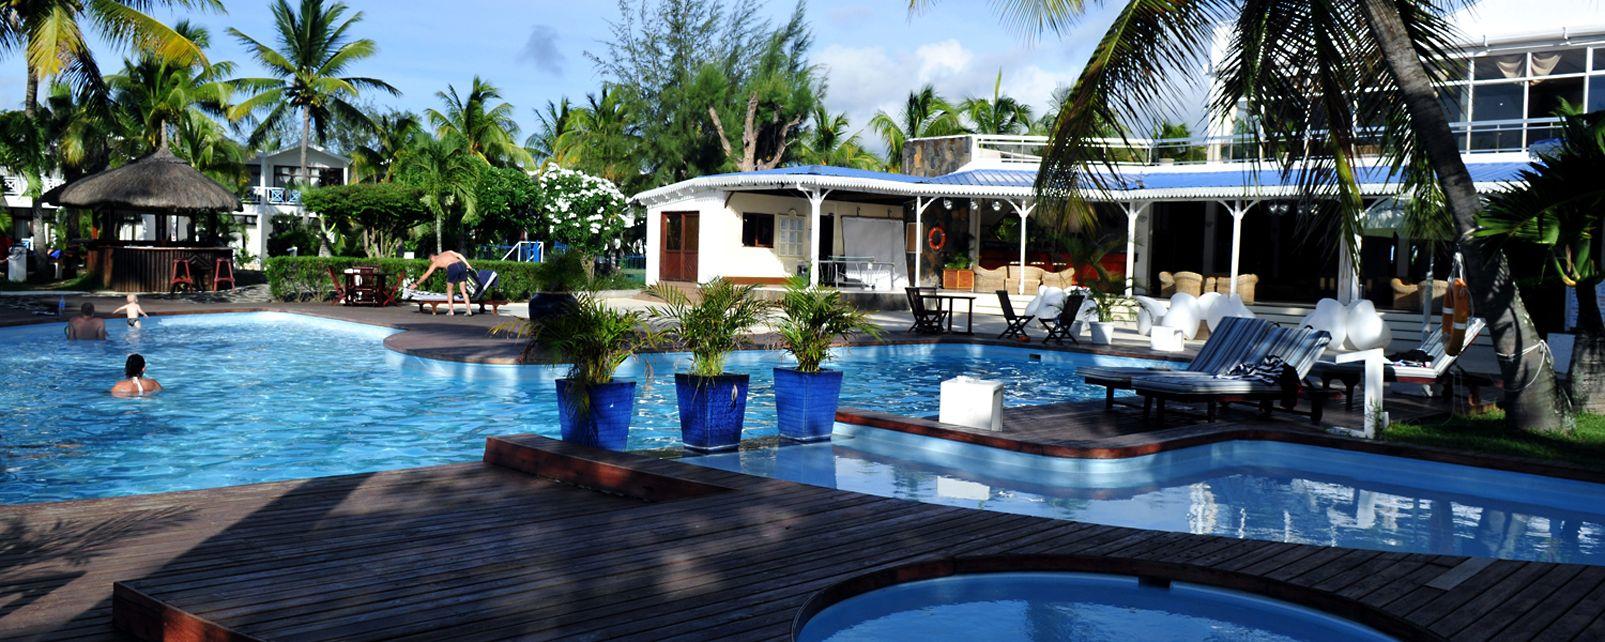 h tel mont choisy coral azur beach resort. Black Bedroom Furniture Sets. Home Design Ideas